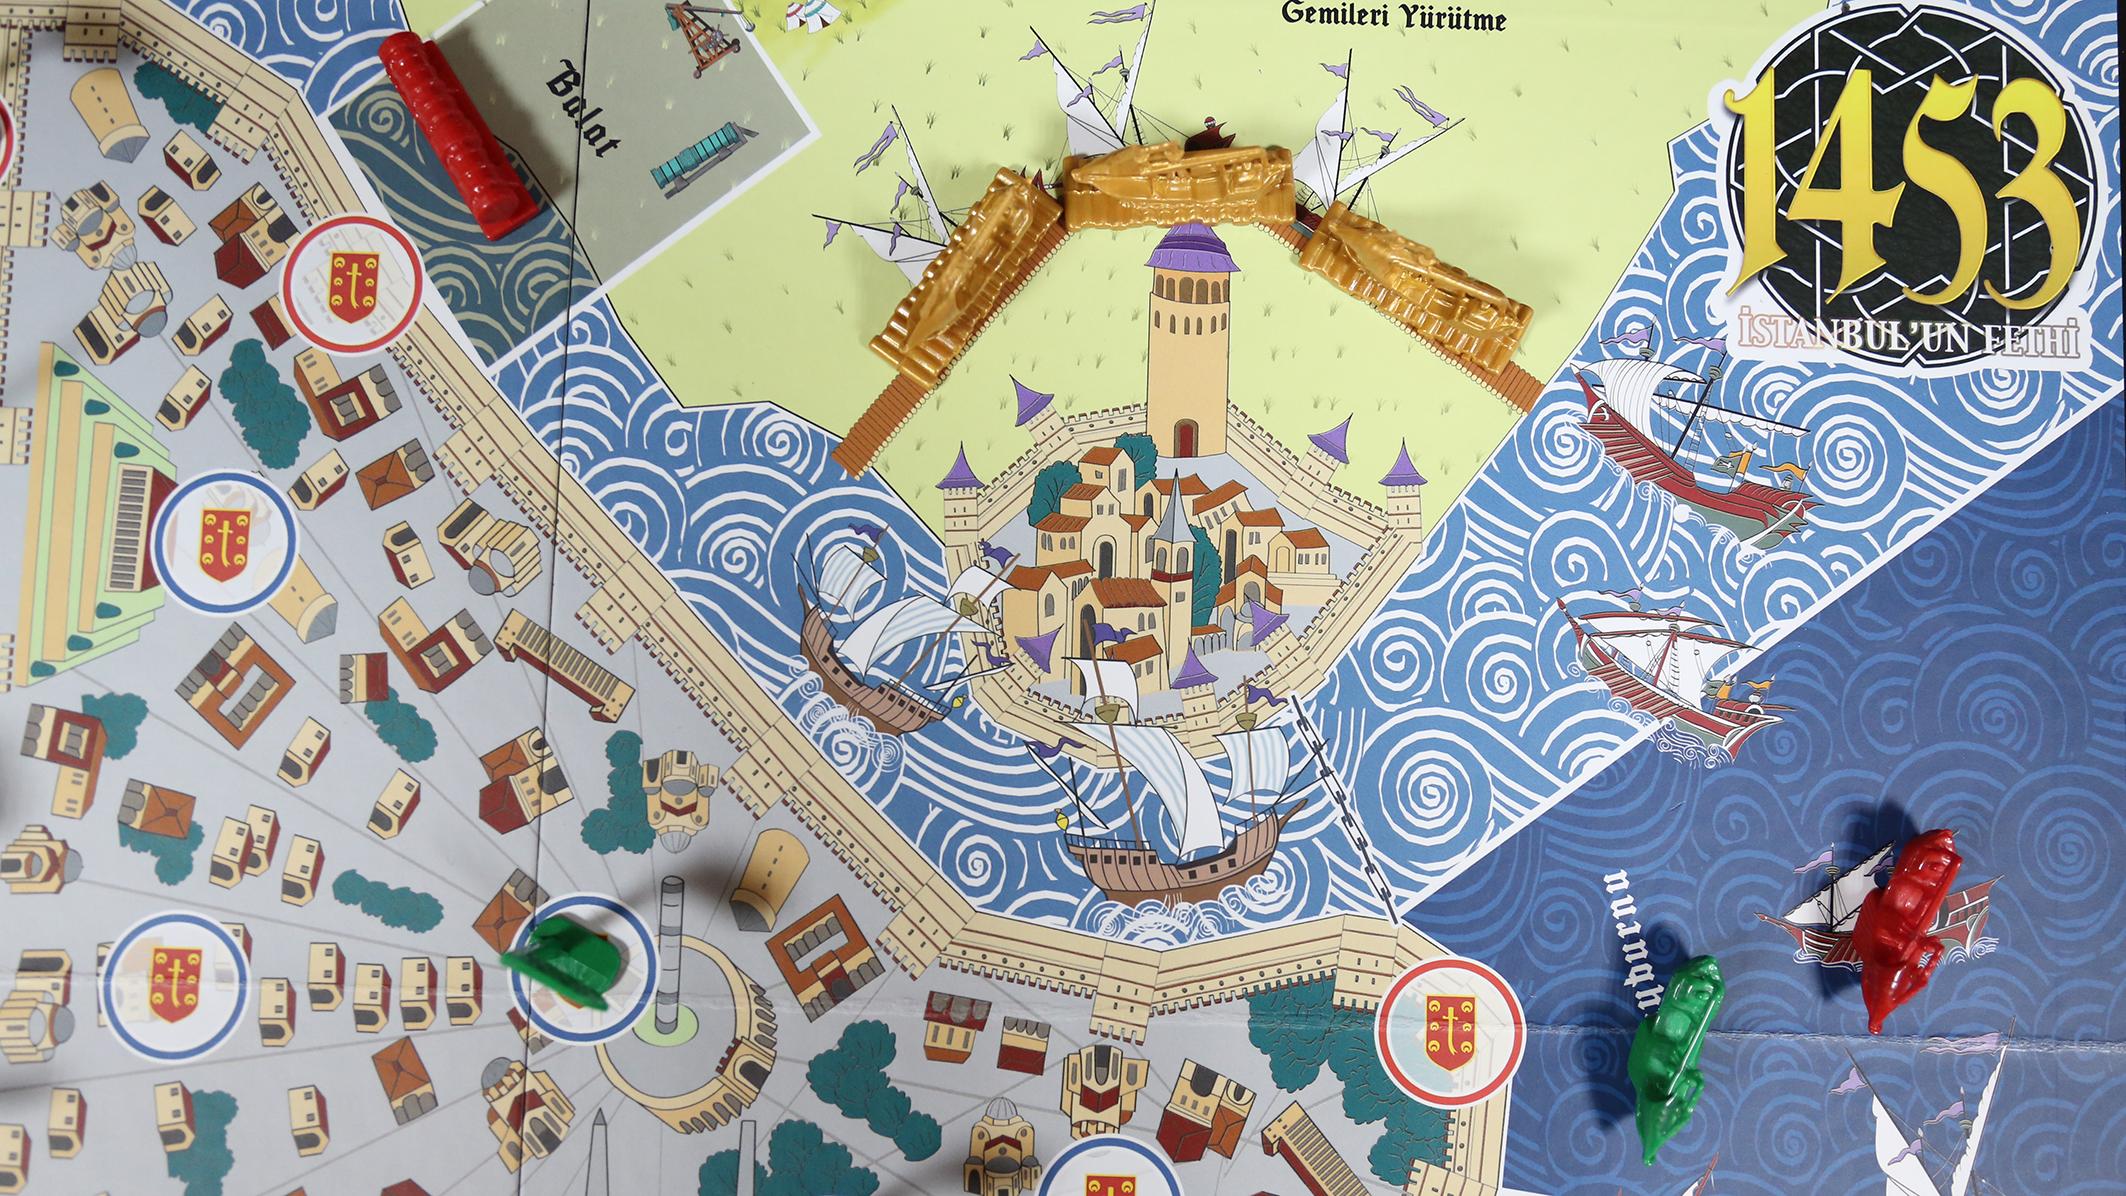 1453-istanbulun-fethi-kutu-oyunu-3